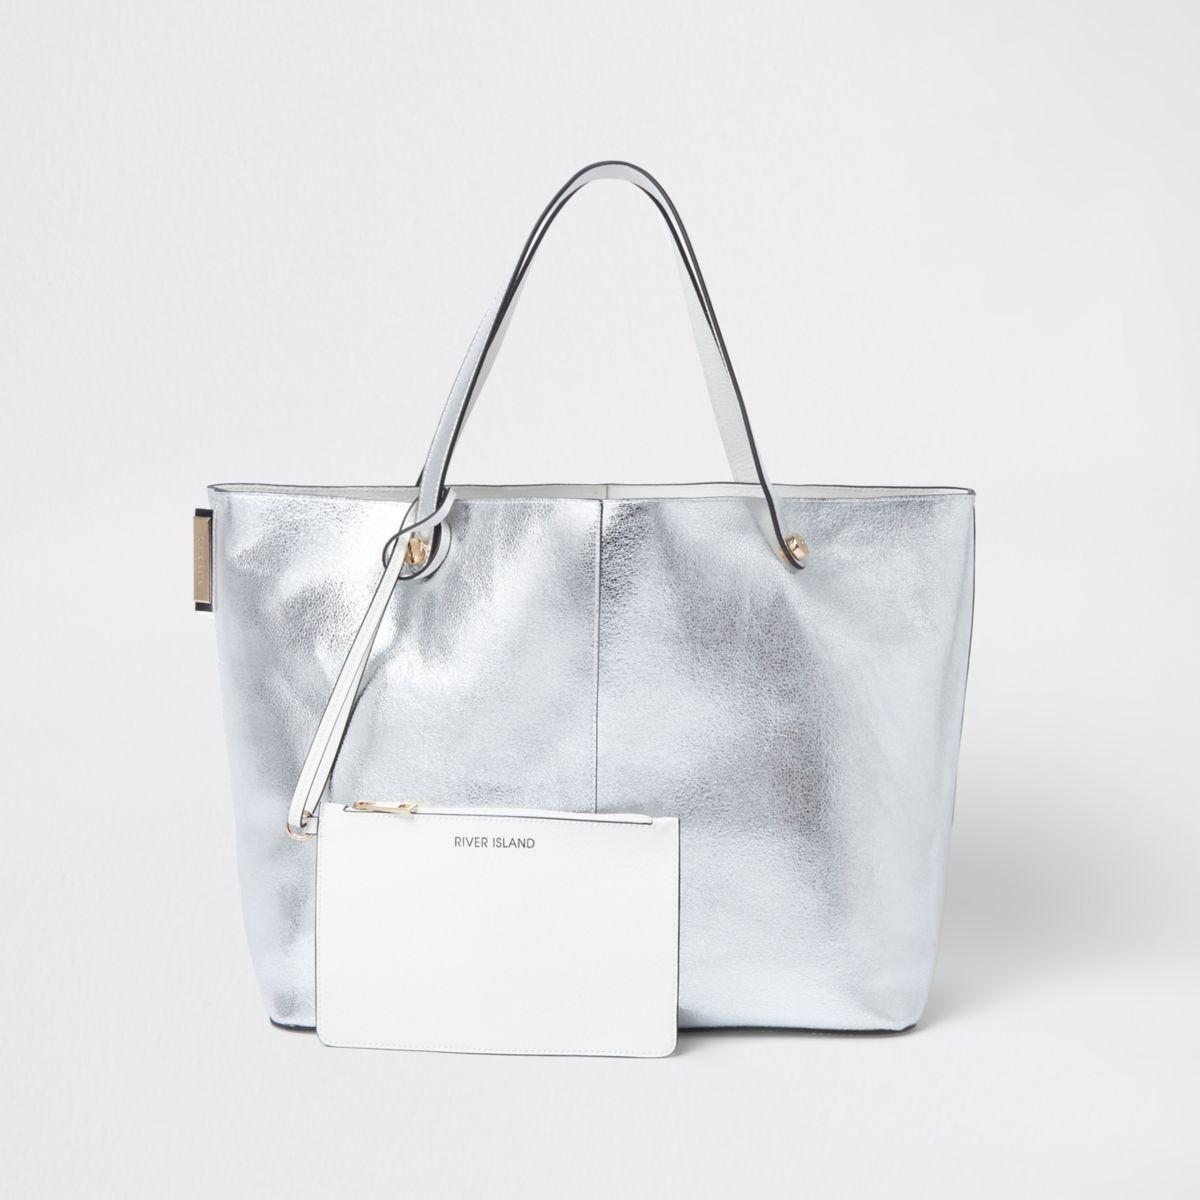 Silver metallic beach tote bag